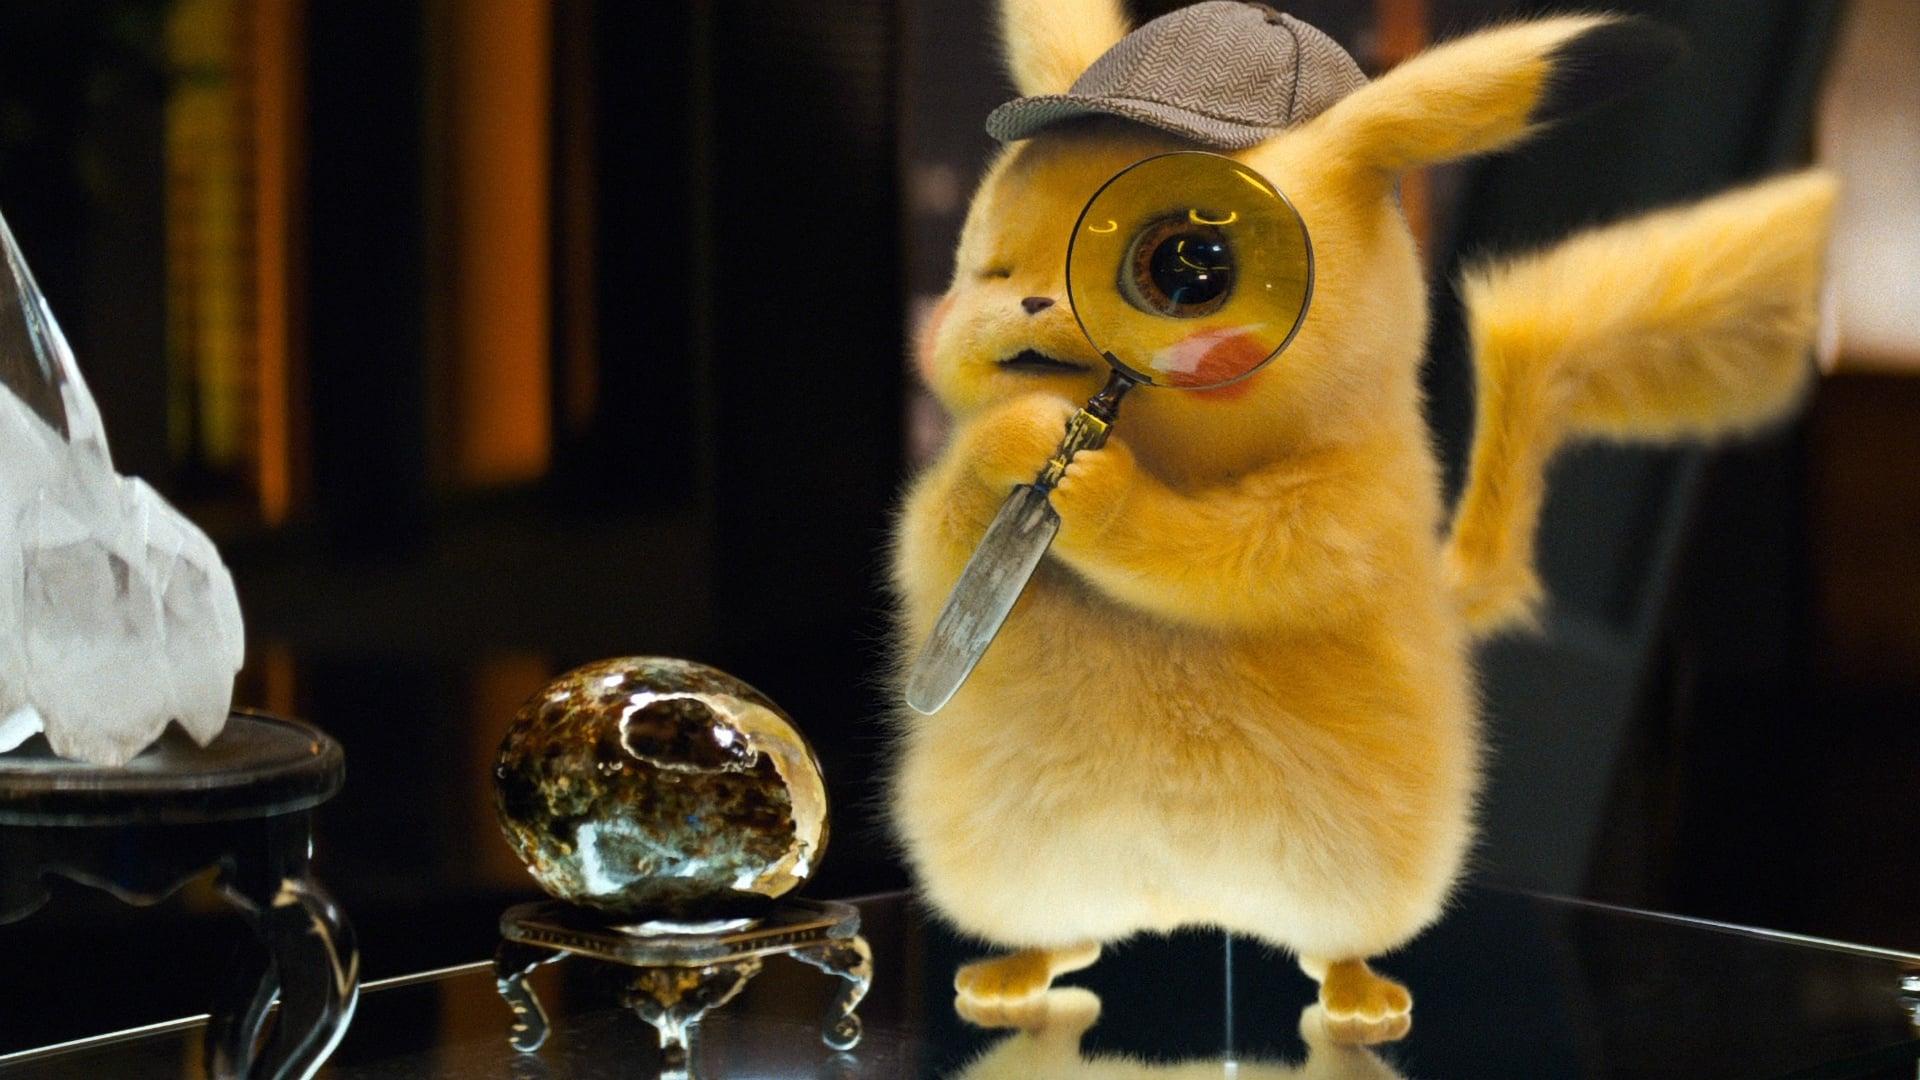 Pokémon Detective Pikachu backdrop